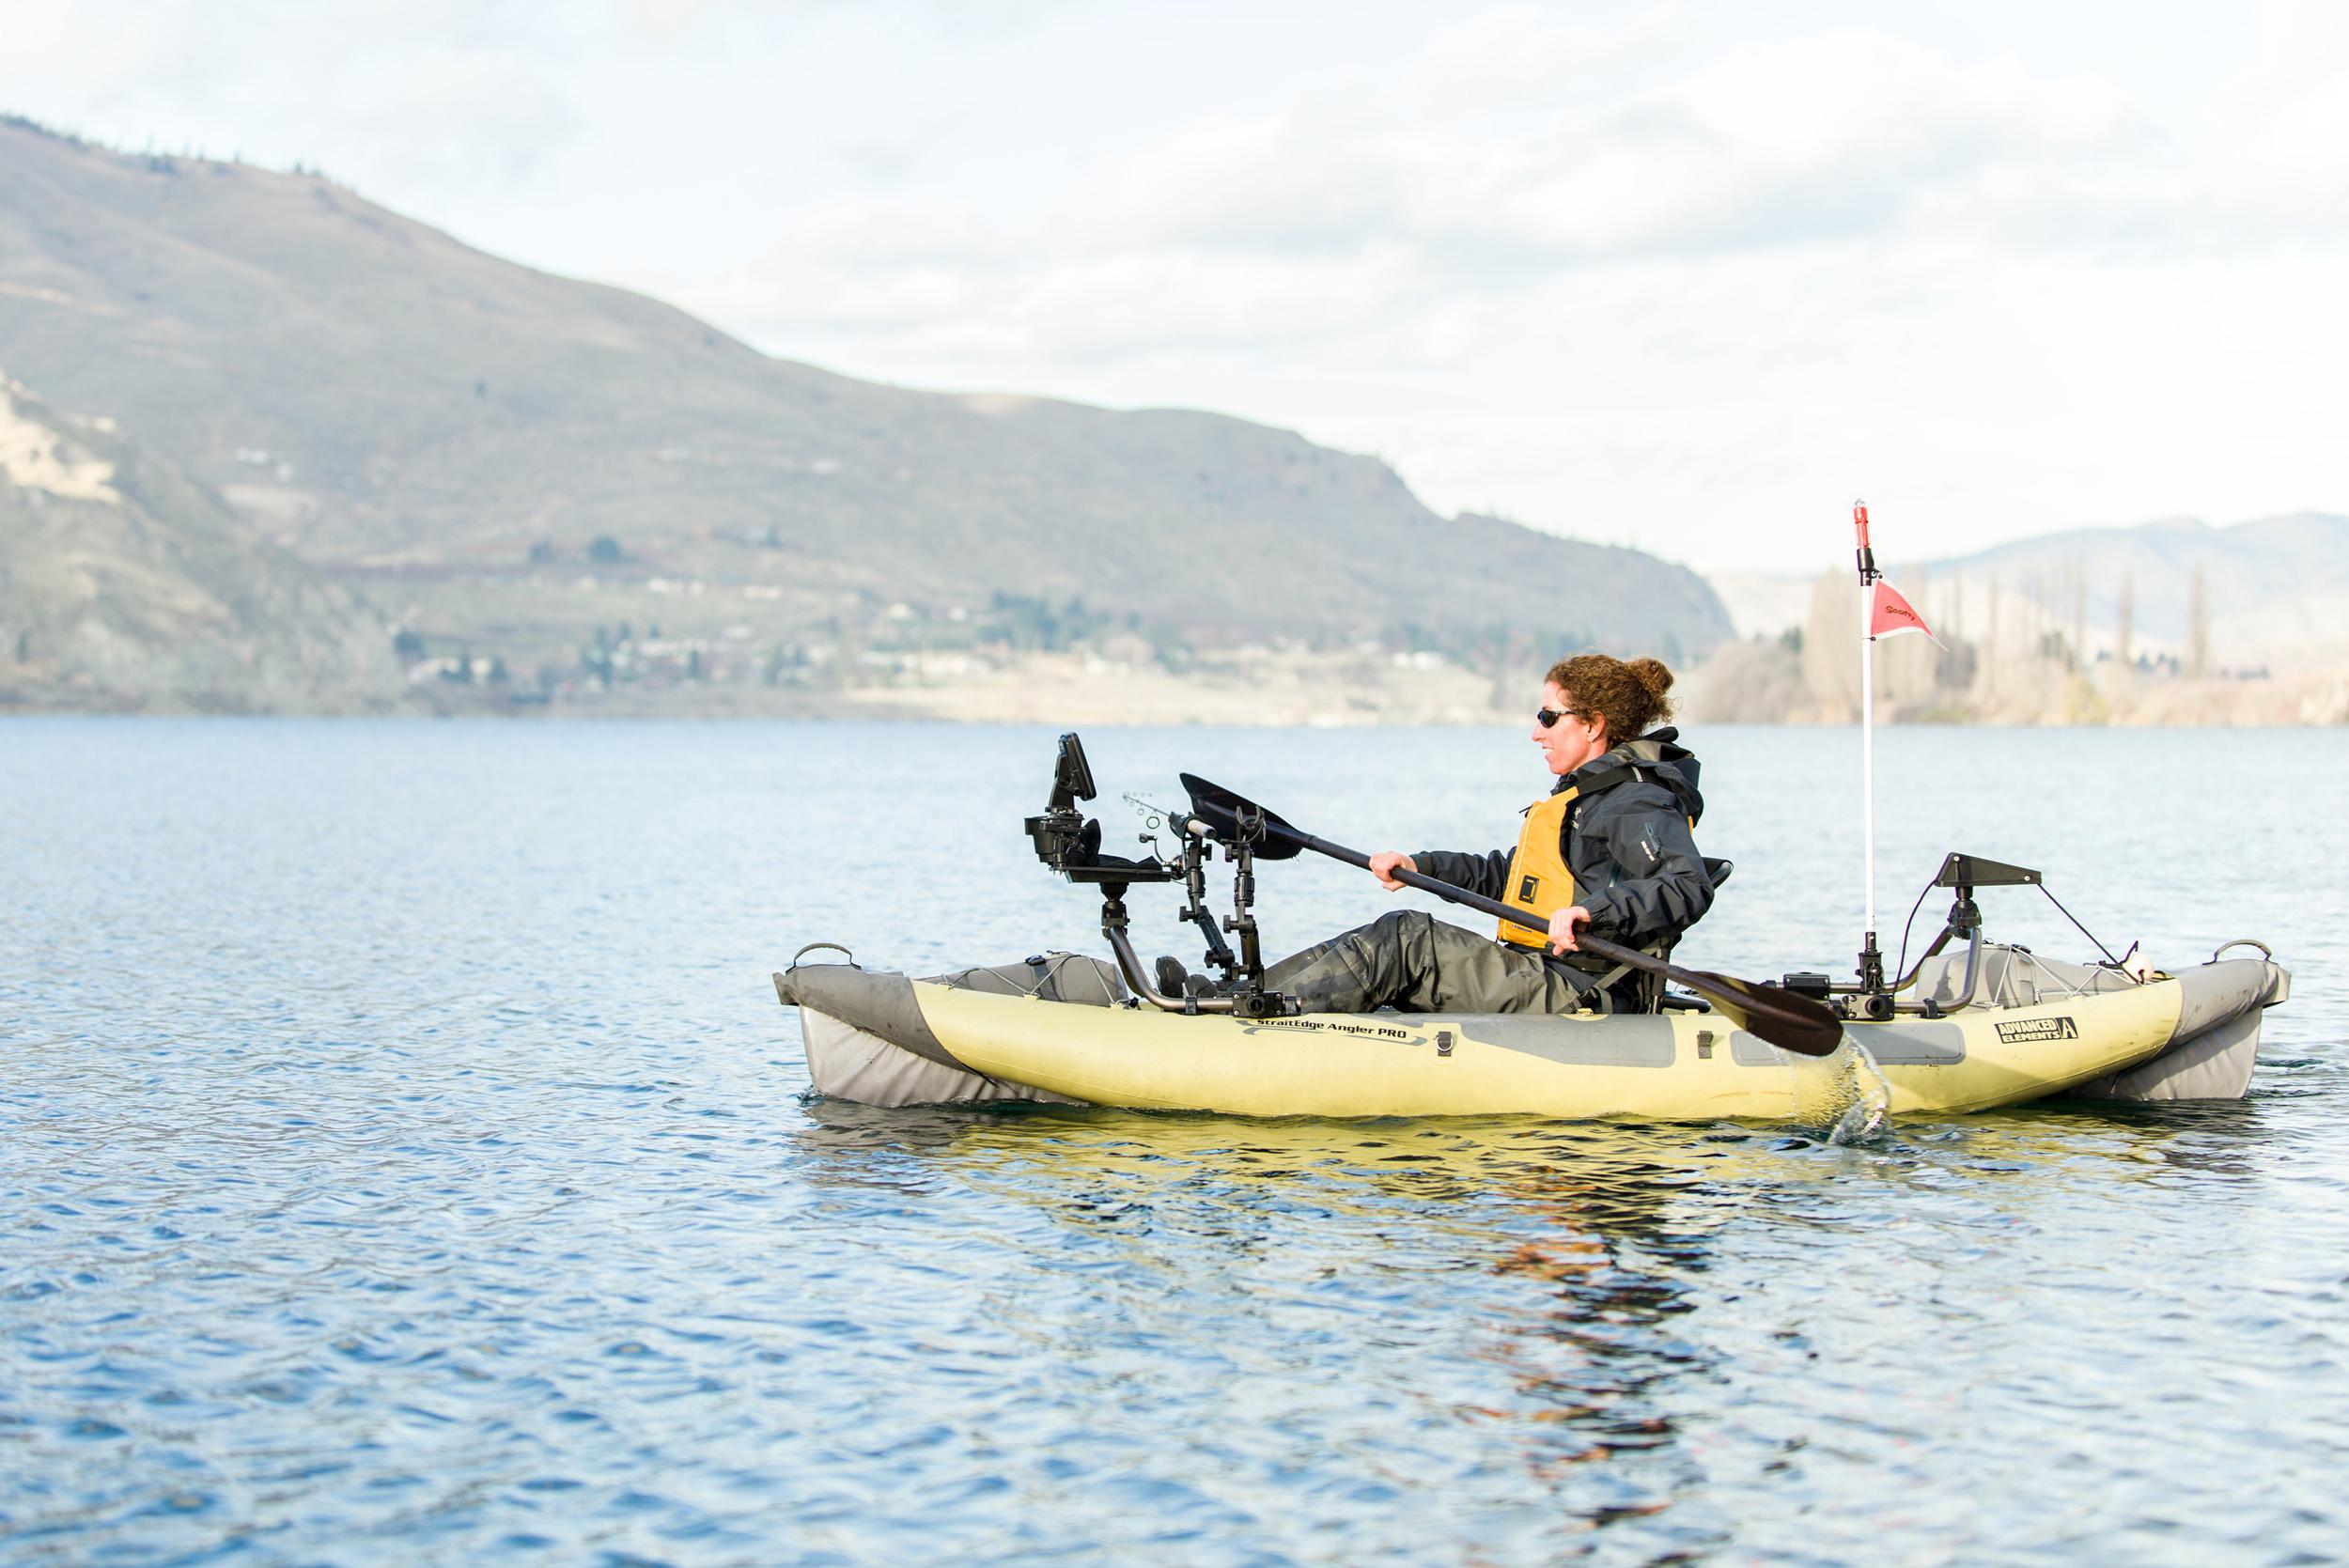 Kayaks: StraitEdge Angler PRO by Advanced Elements - Image 4514